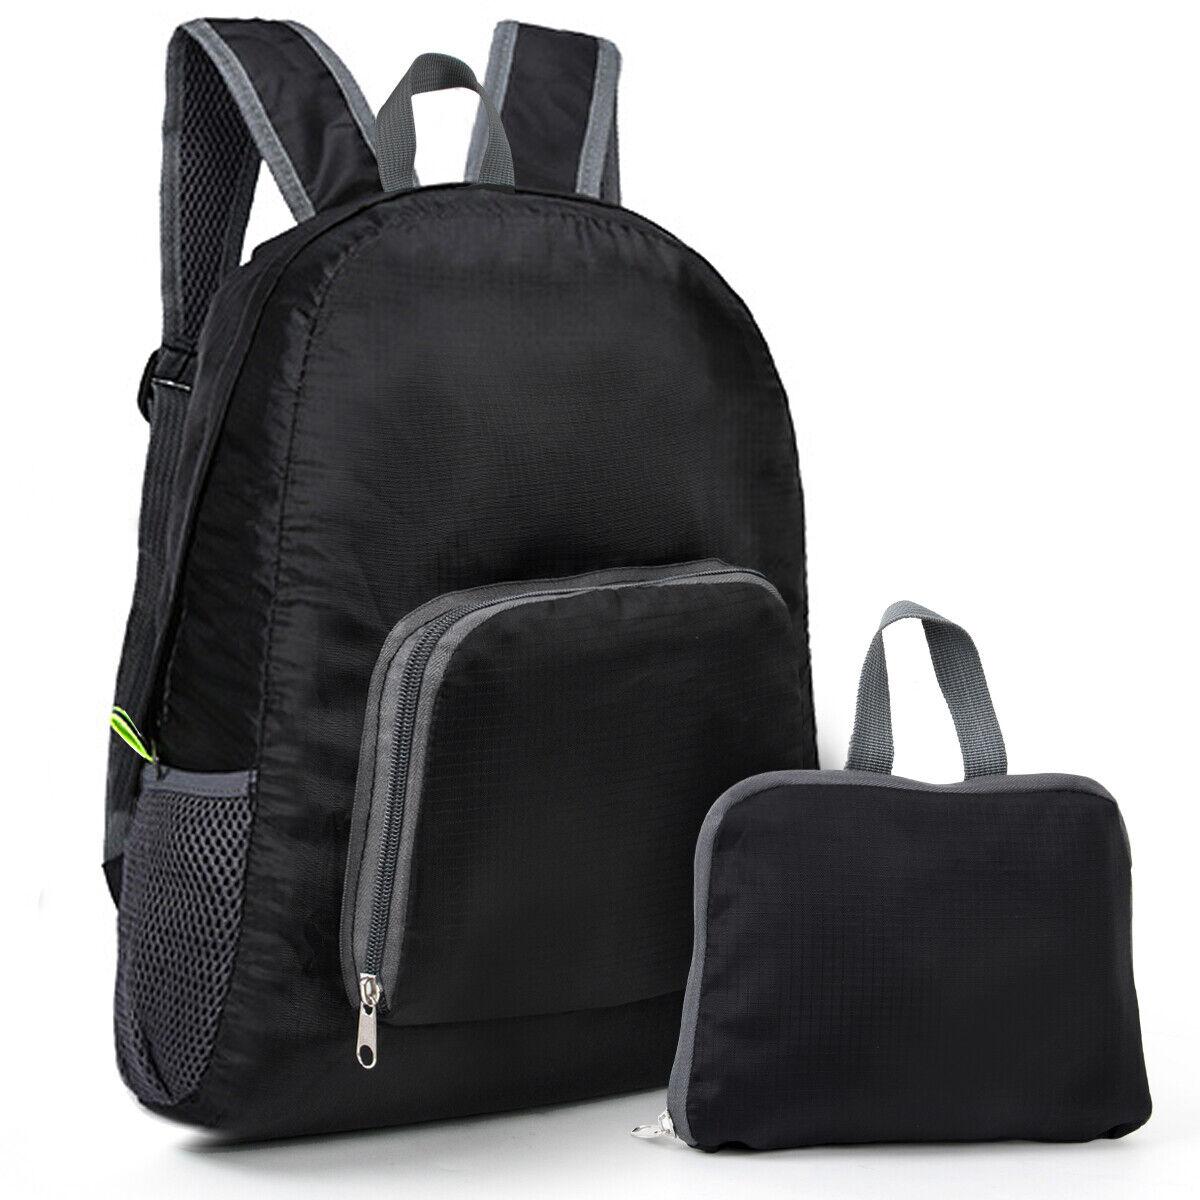 Ultralight Backpack Foldable Waterproof Travel Daypack Packable Shoulder Bags